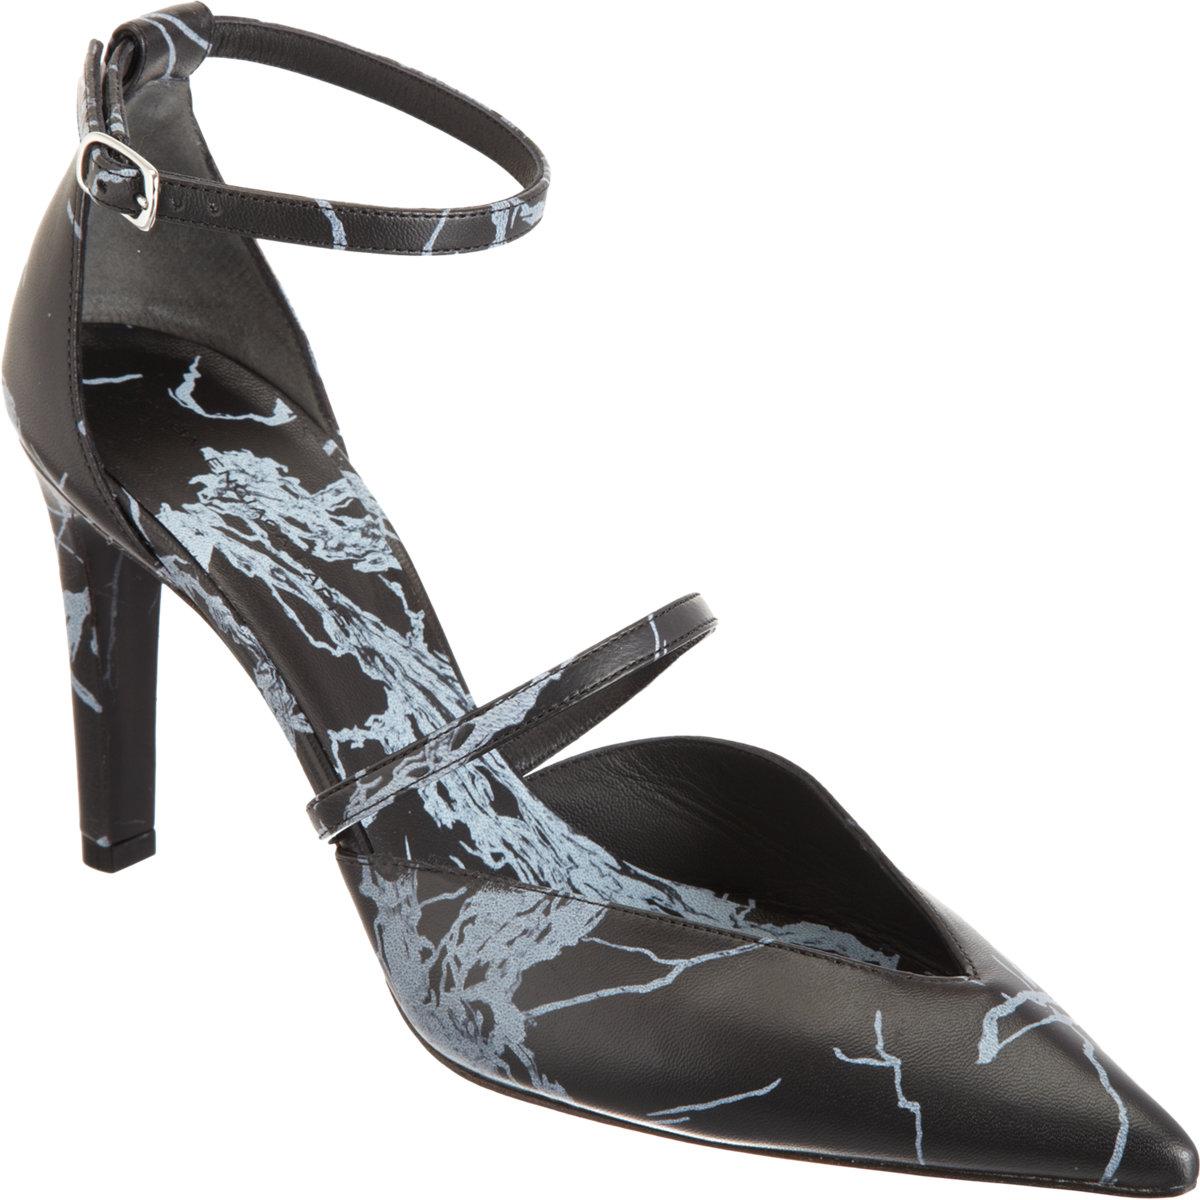 Balenciaga Imprime Marble-Effect Ankle Strap Pump at Barneys.com